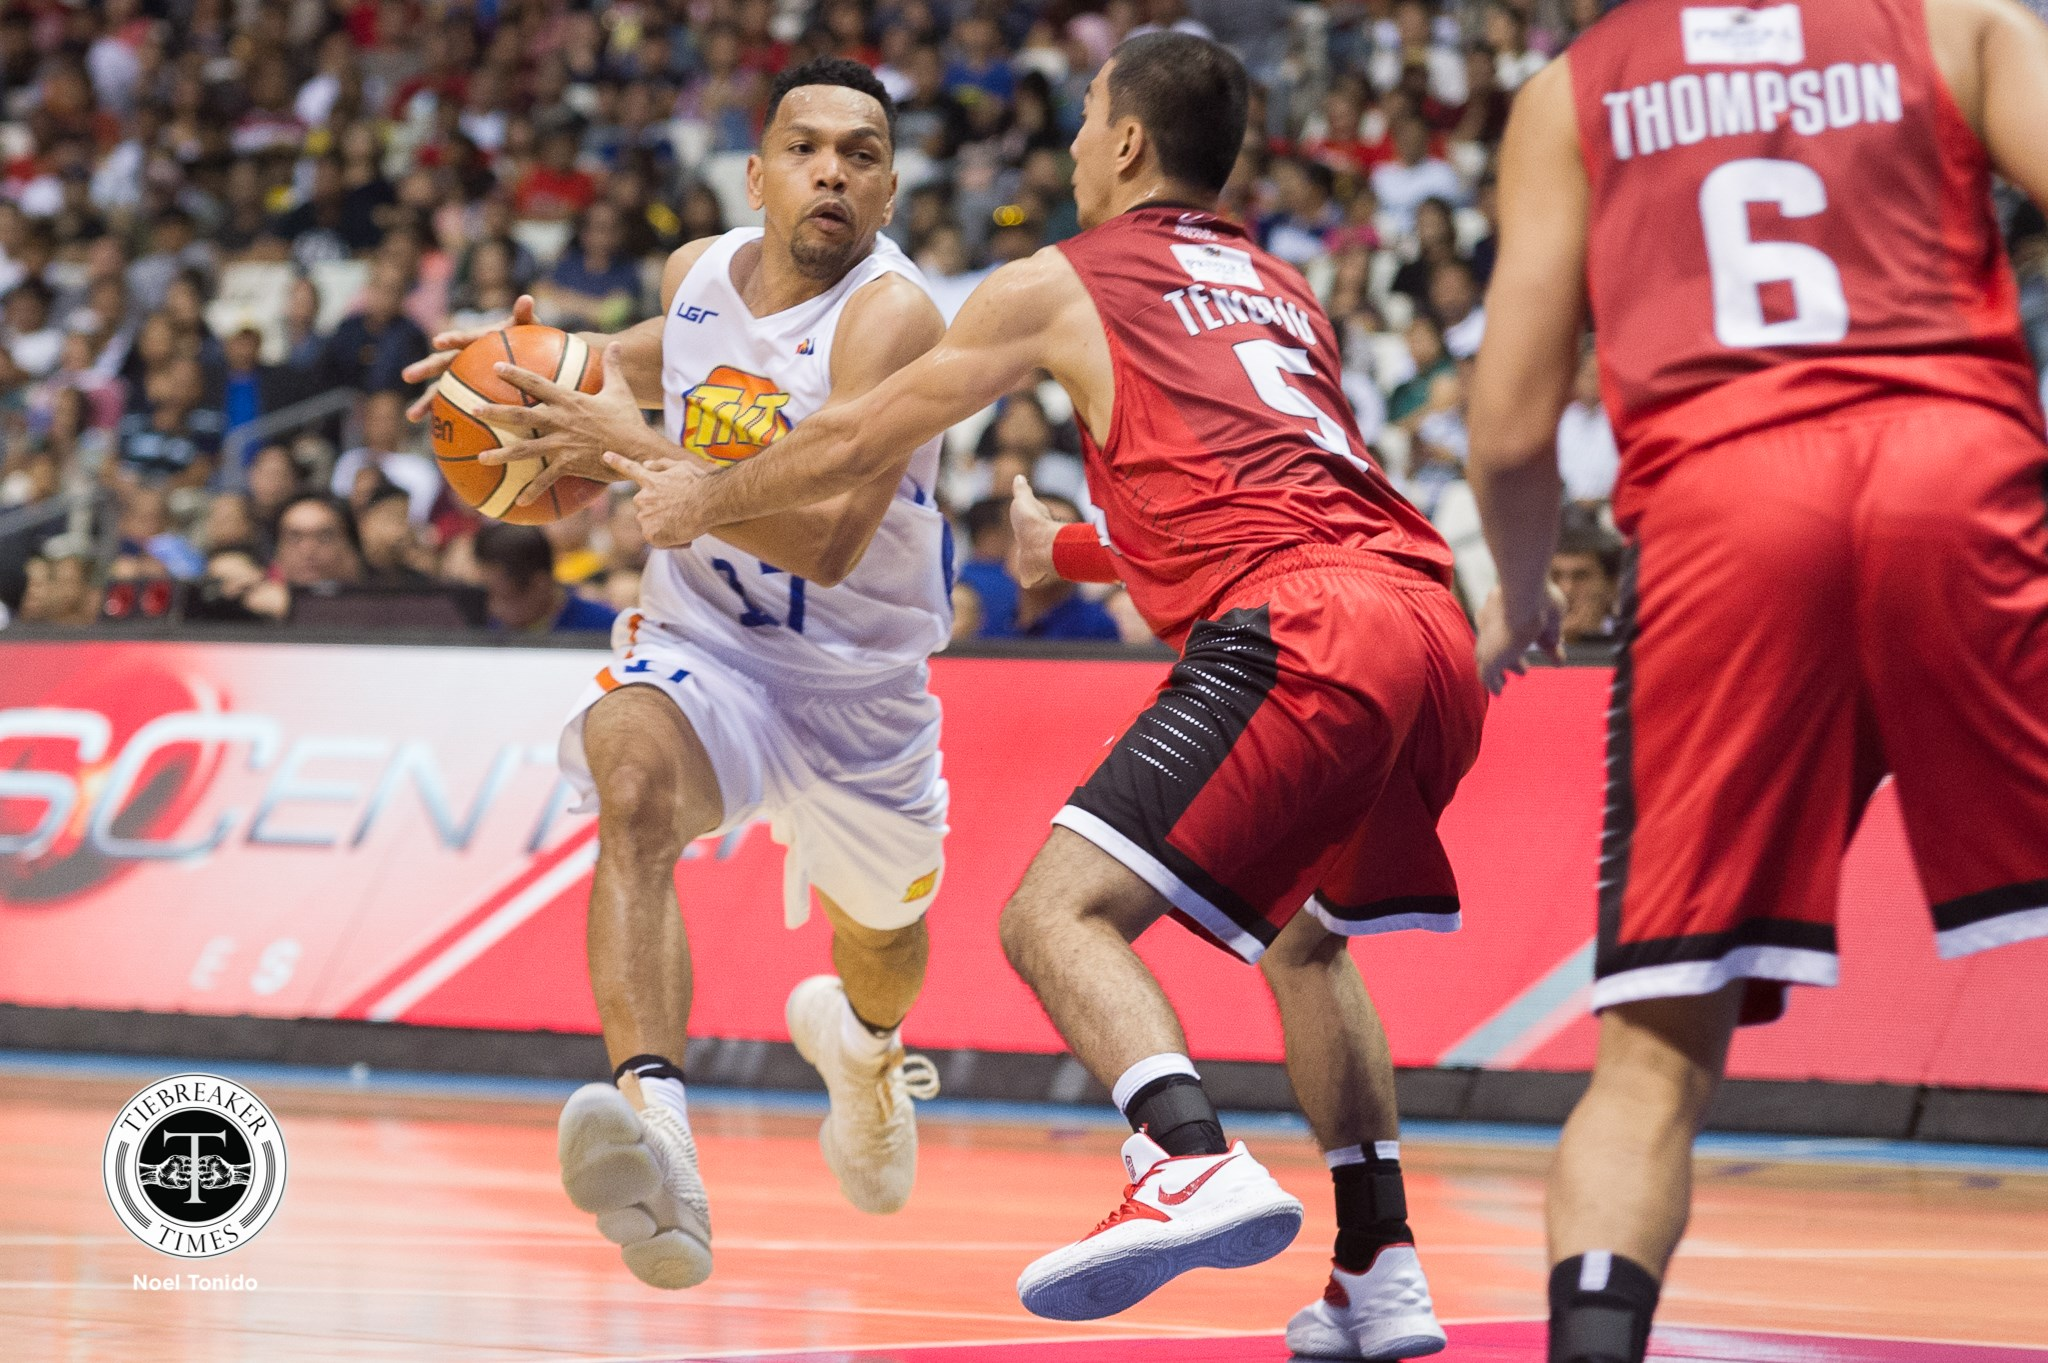 Tiebreaker Times New TNT will live and die by the three, says Jayson Castro Basketball News PBA  TNT Katropa PBA Season 44 Jayson Castro 2019 PBA Philippine Cup